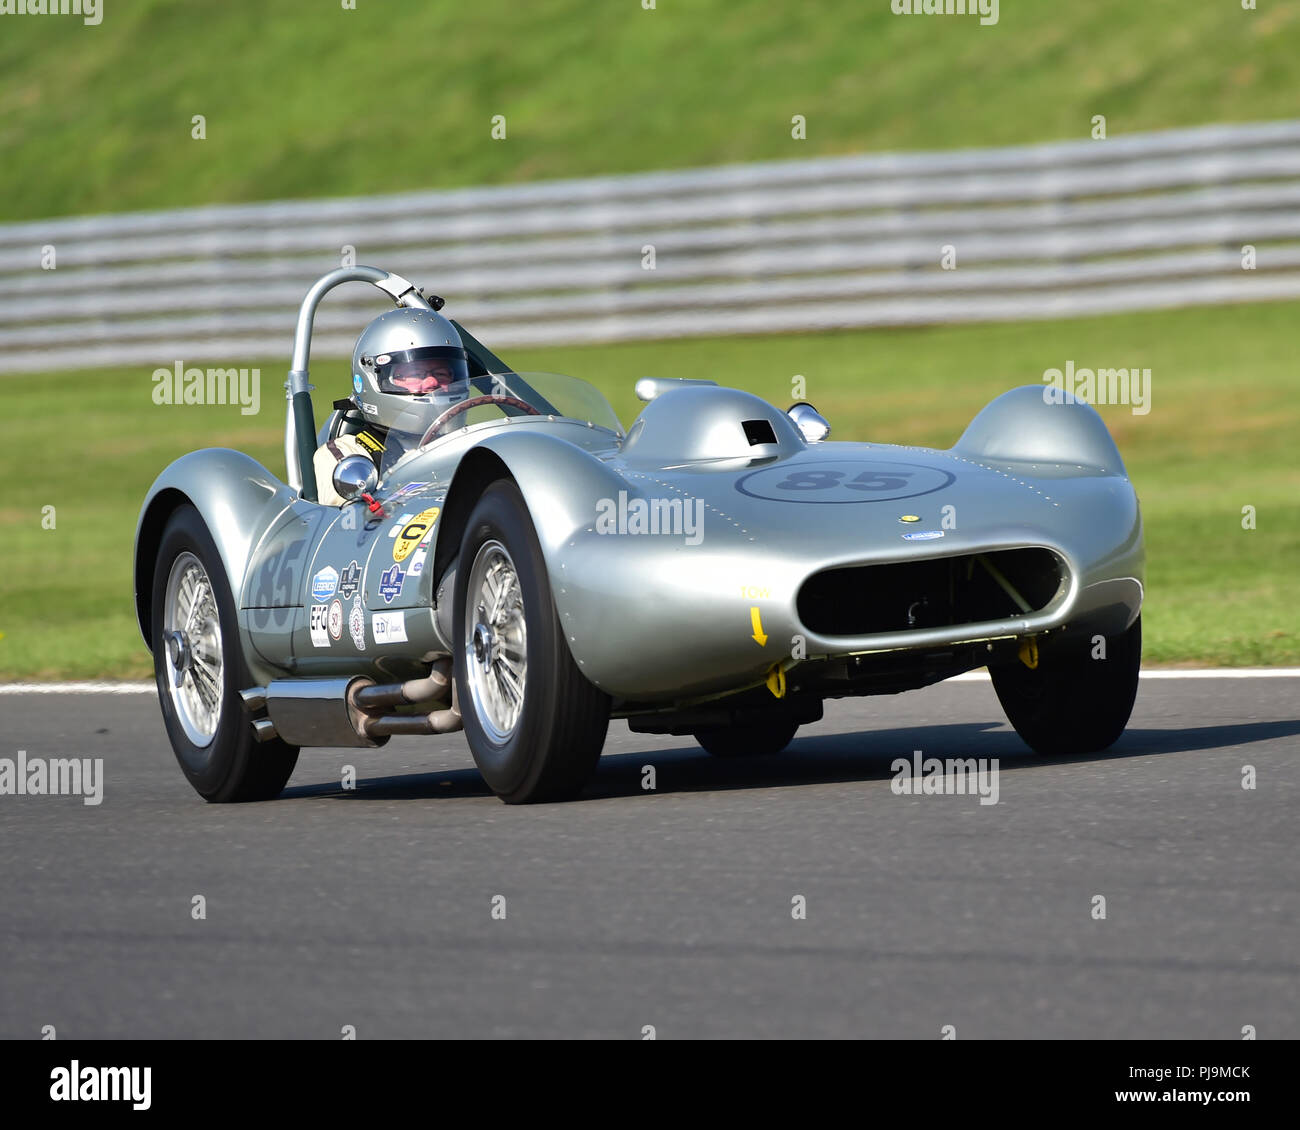 Aston Martin Owners Club Racing Stock Photos & Aston